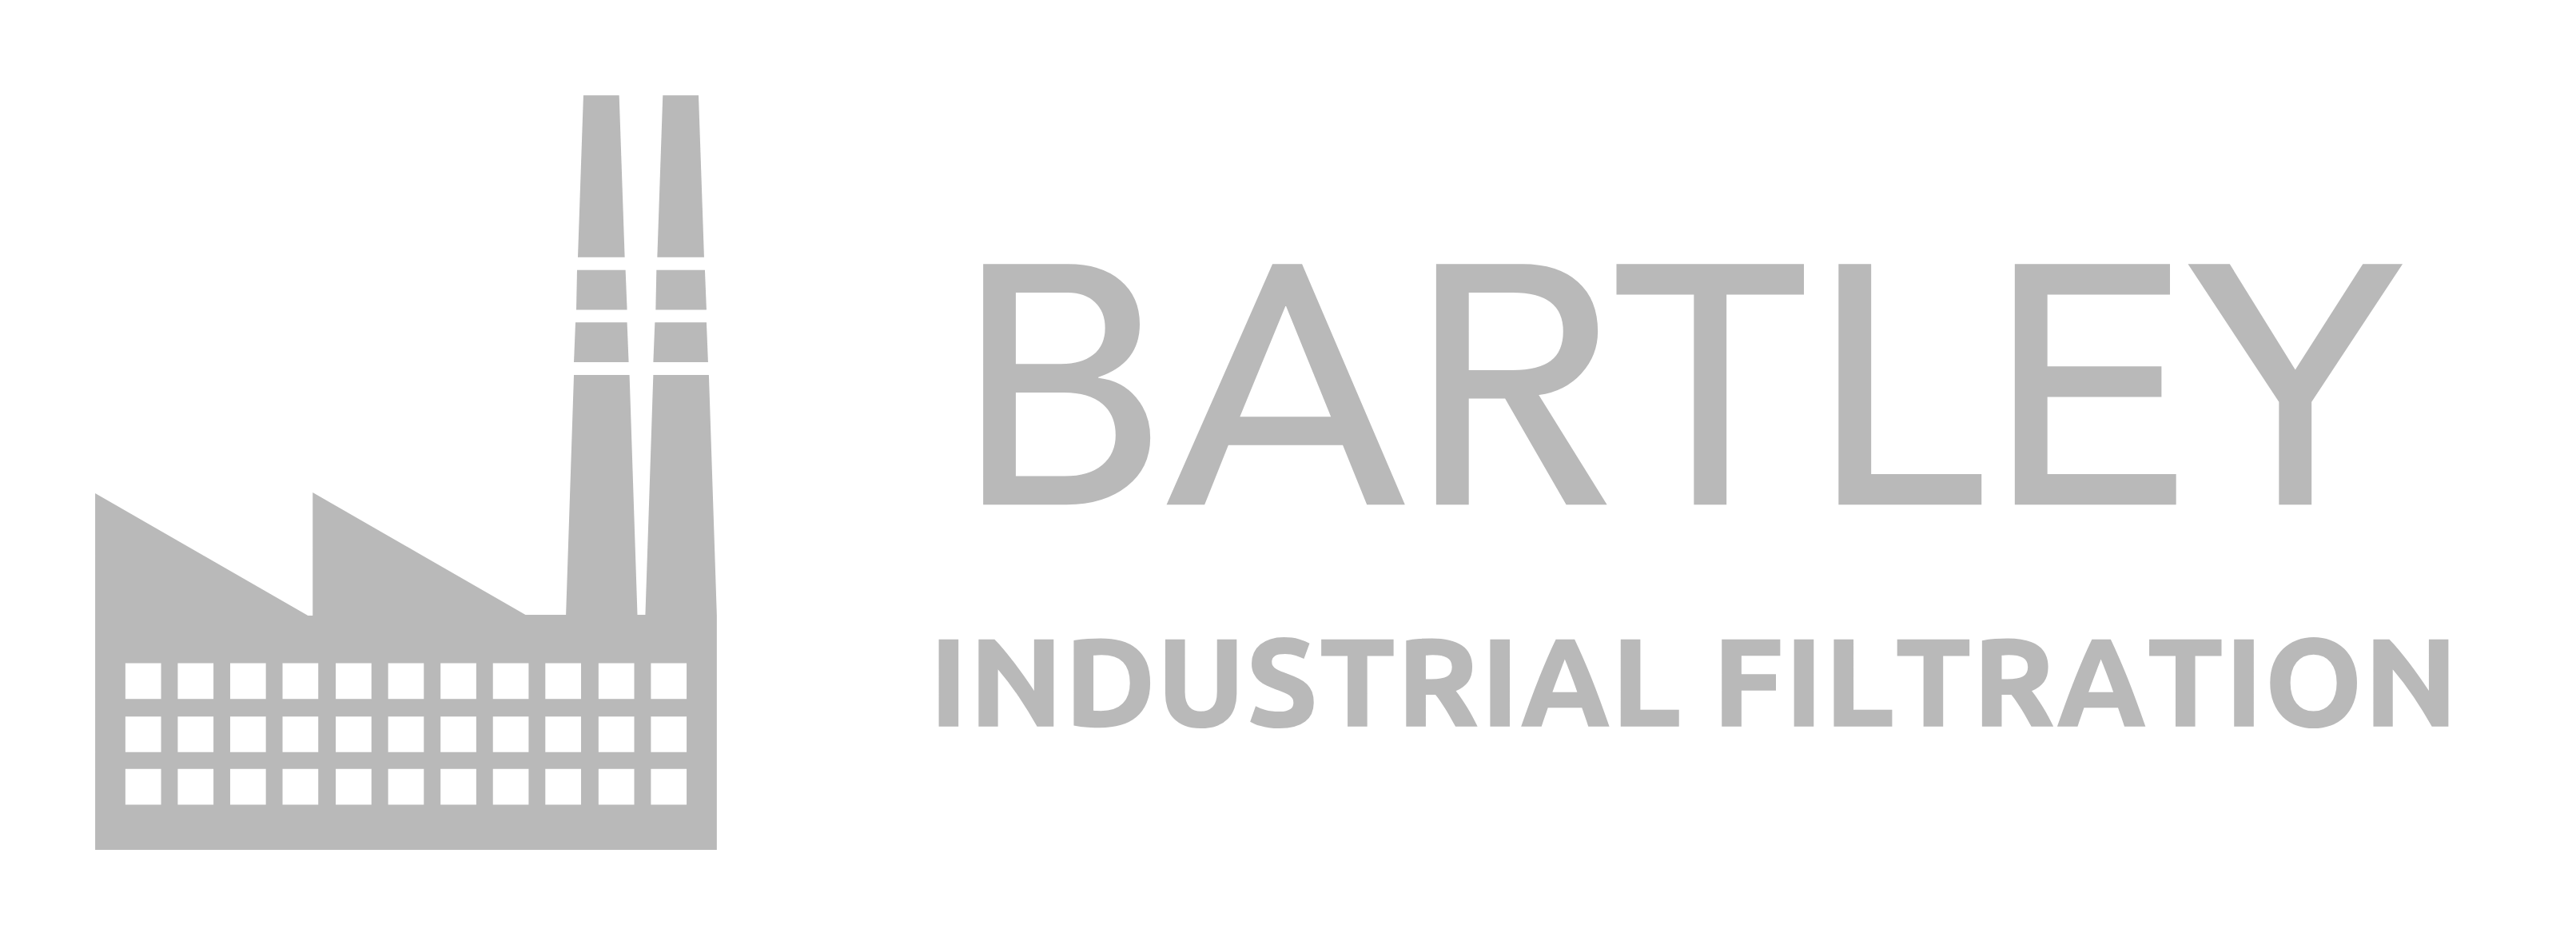 Bartley Industrial Filtration